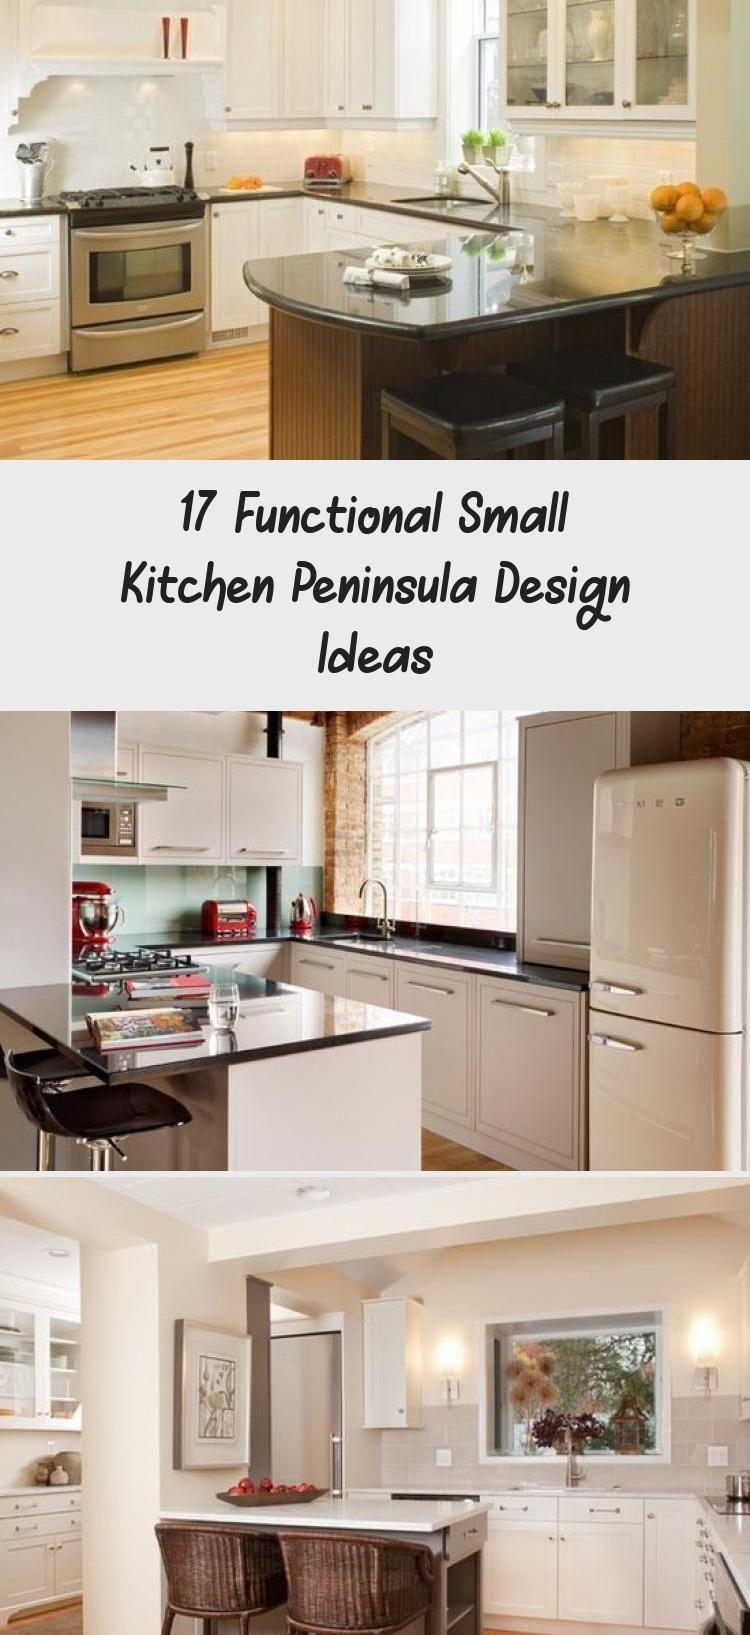 9 Functional Small Kitchen Peninsula Design Ideas ...